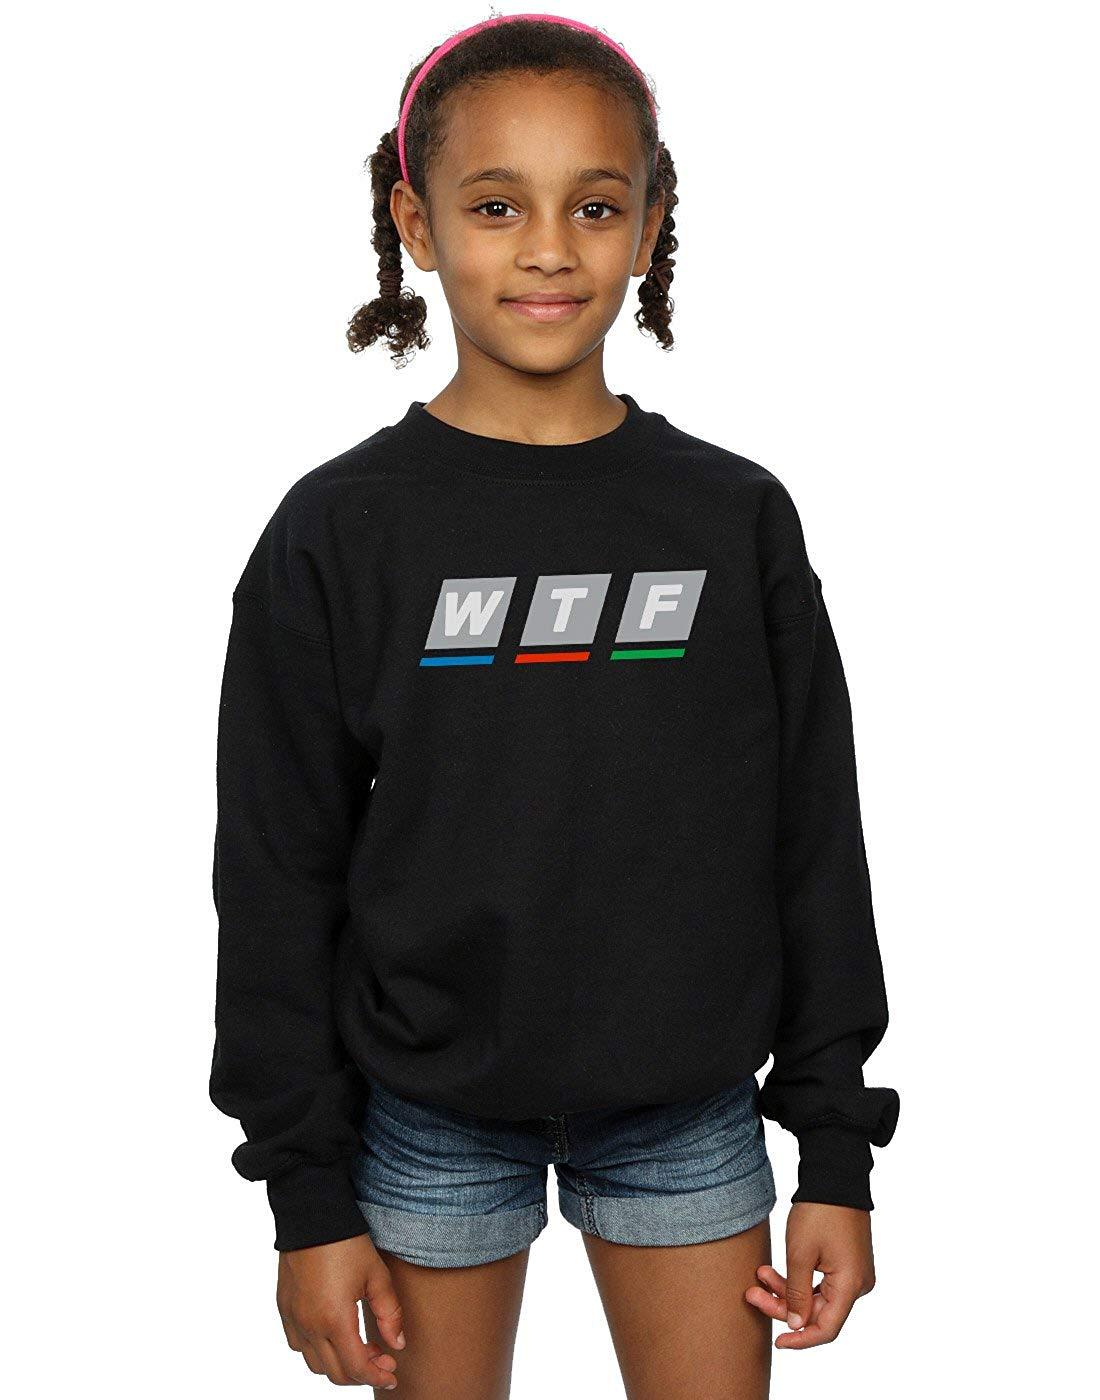 ABSOLUTECULT Drewbacca Girls WTF Broadcasting Sweatshirt